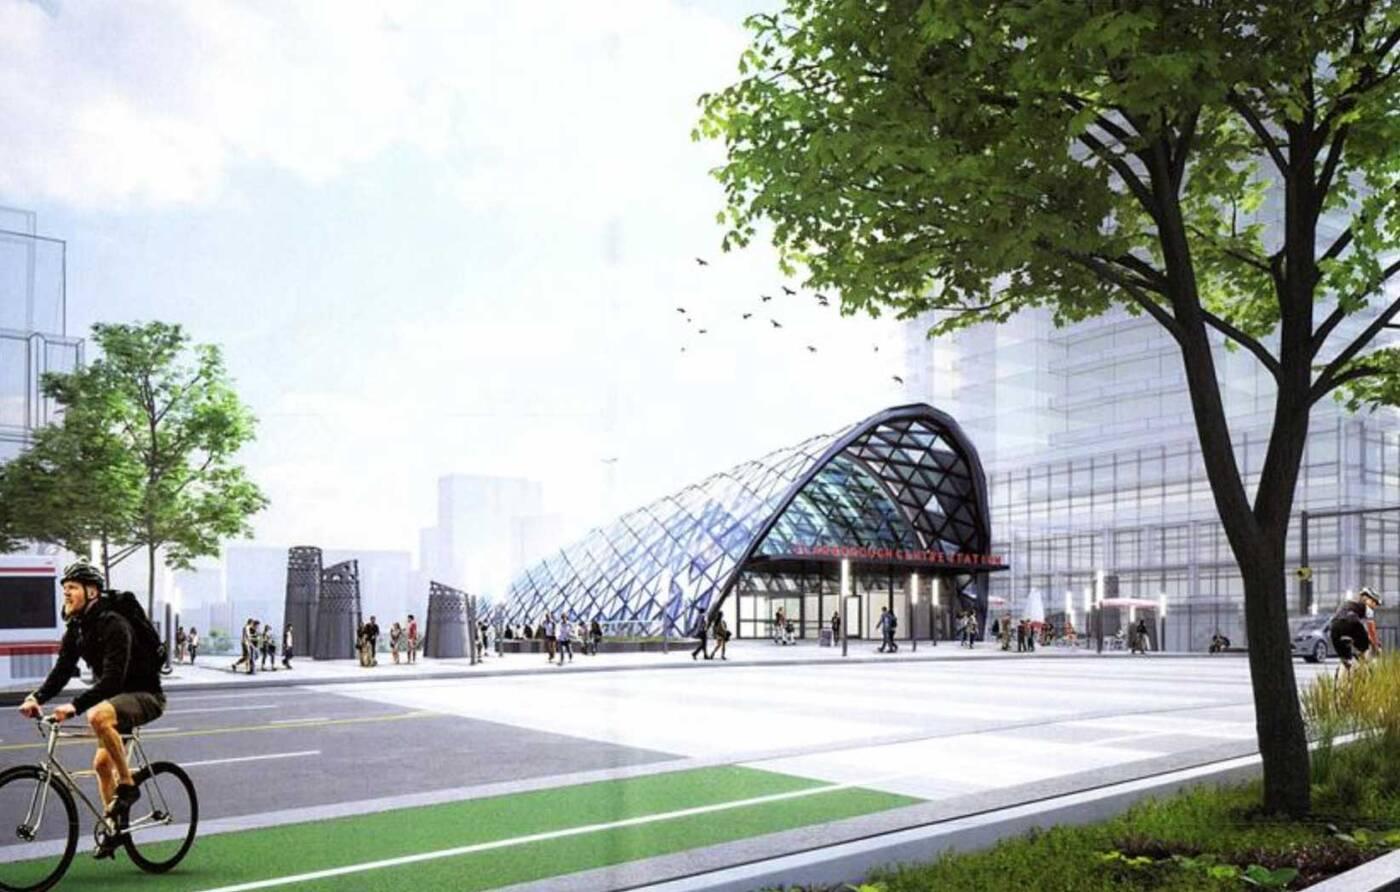 scarborough centre station